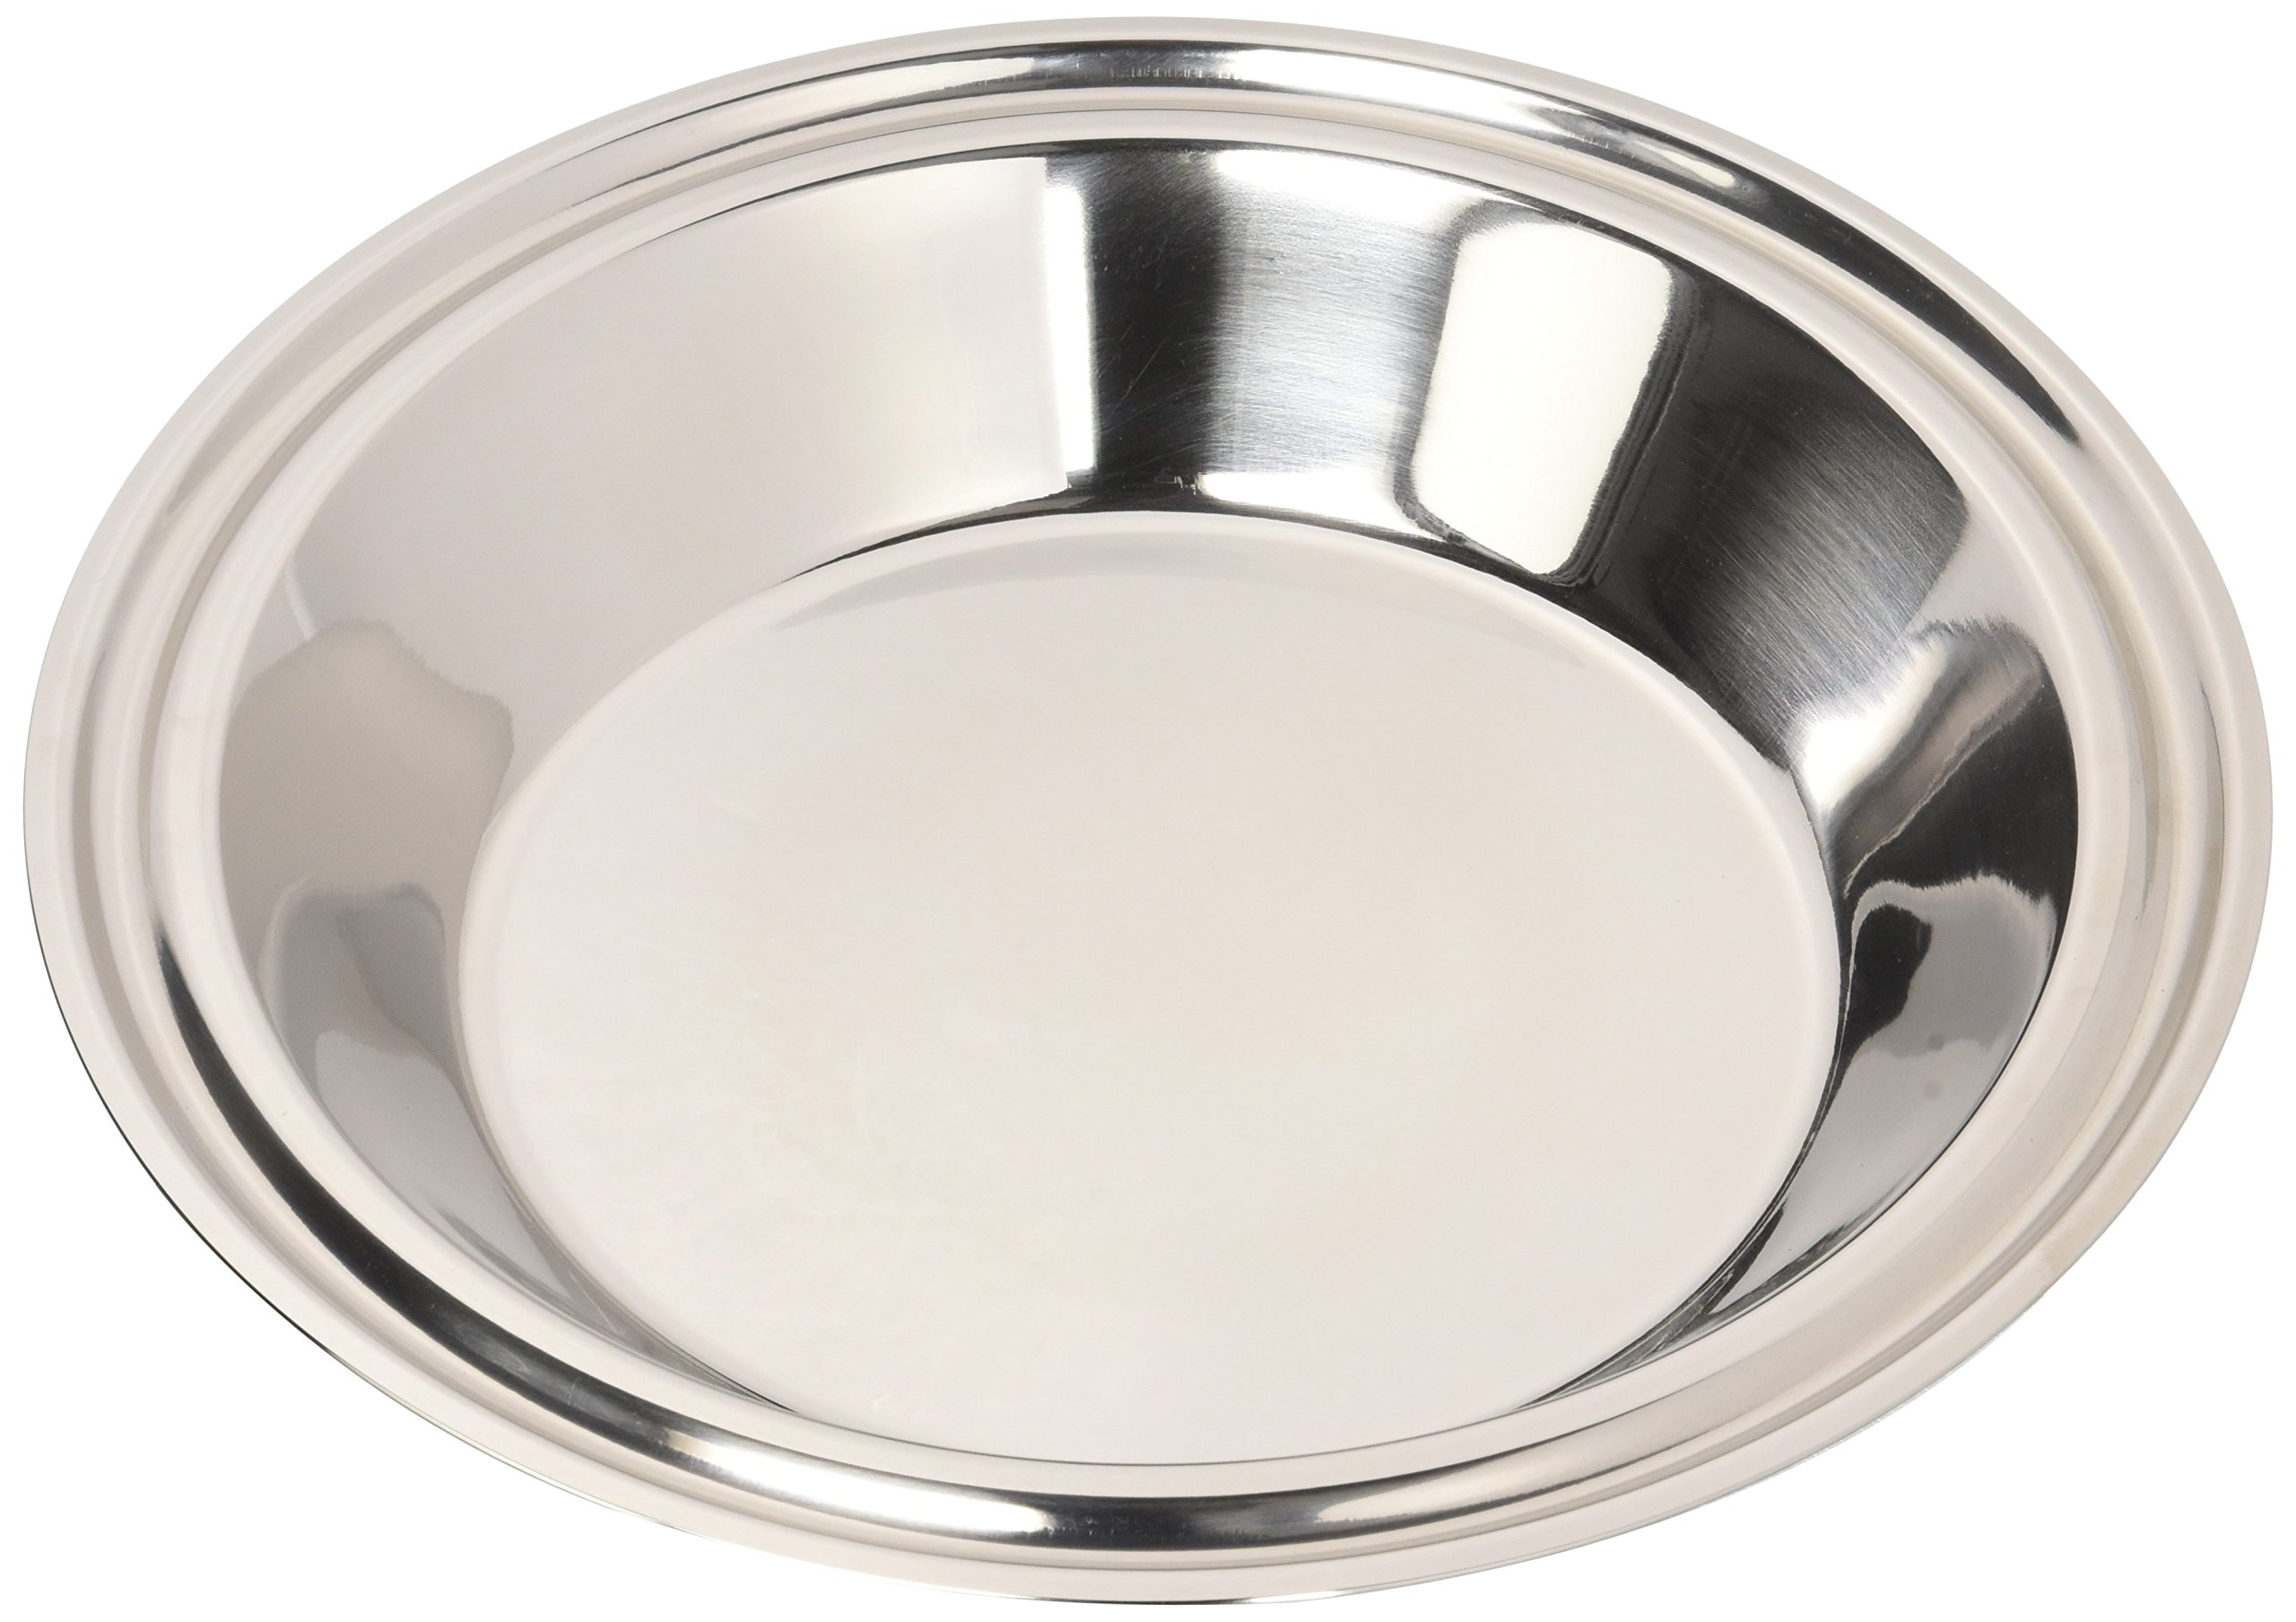 Hammer Stahl 9'' Pie Plate, Stainless Steel